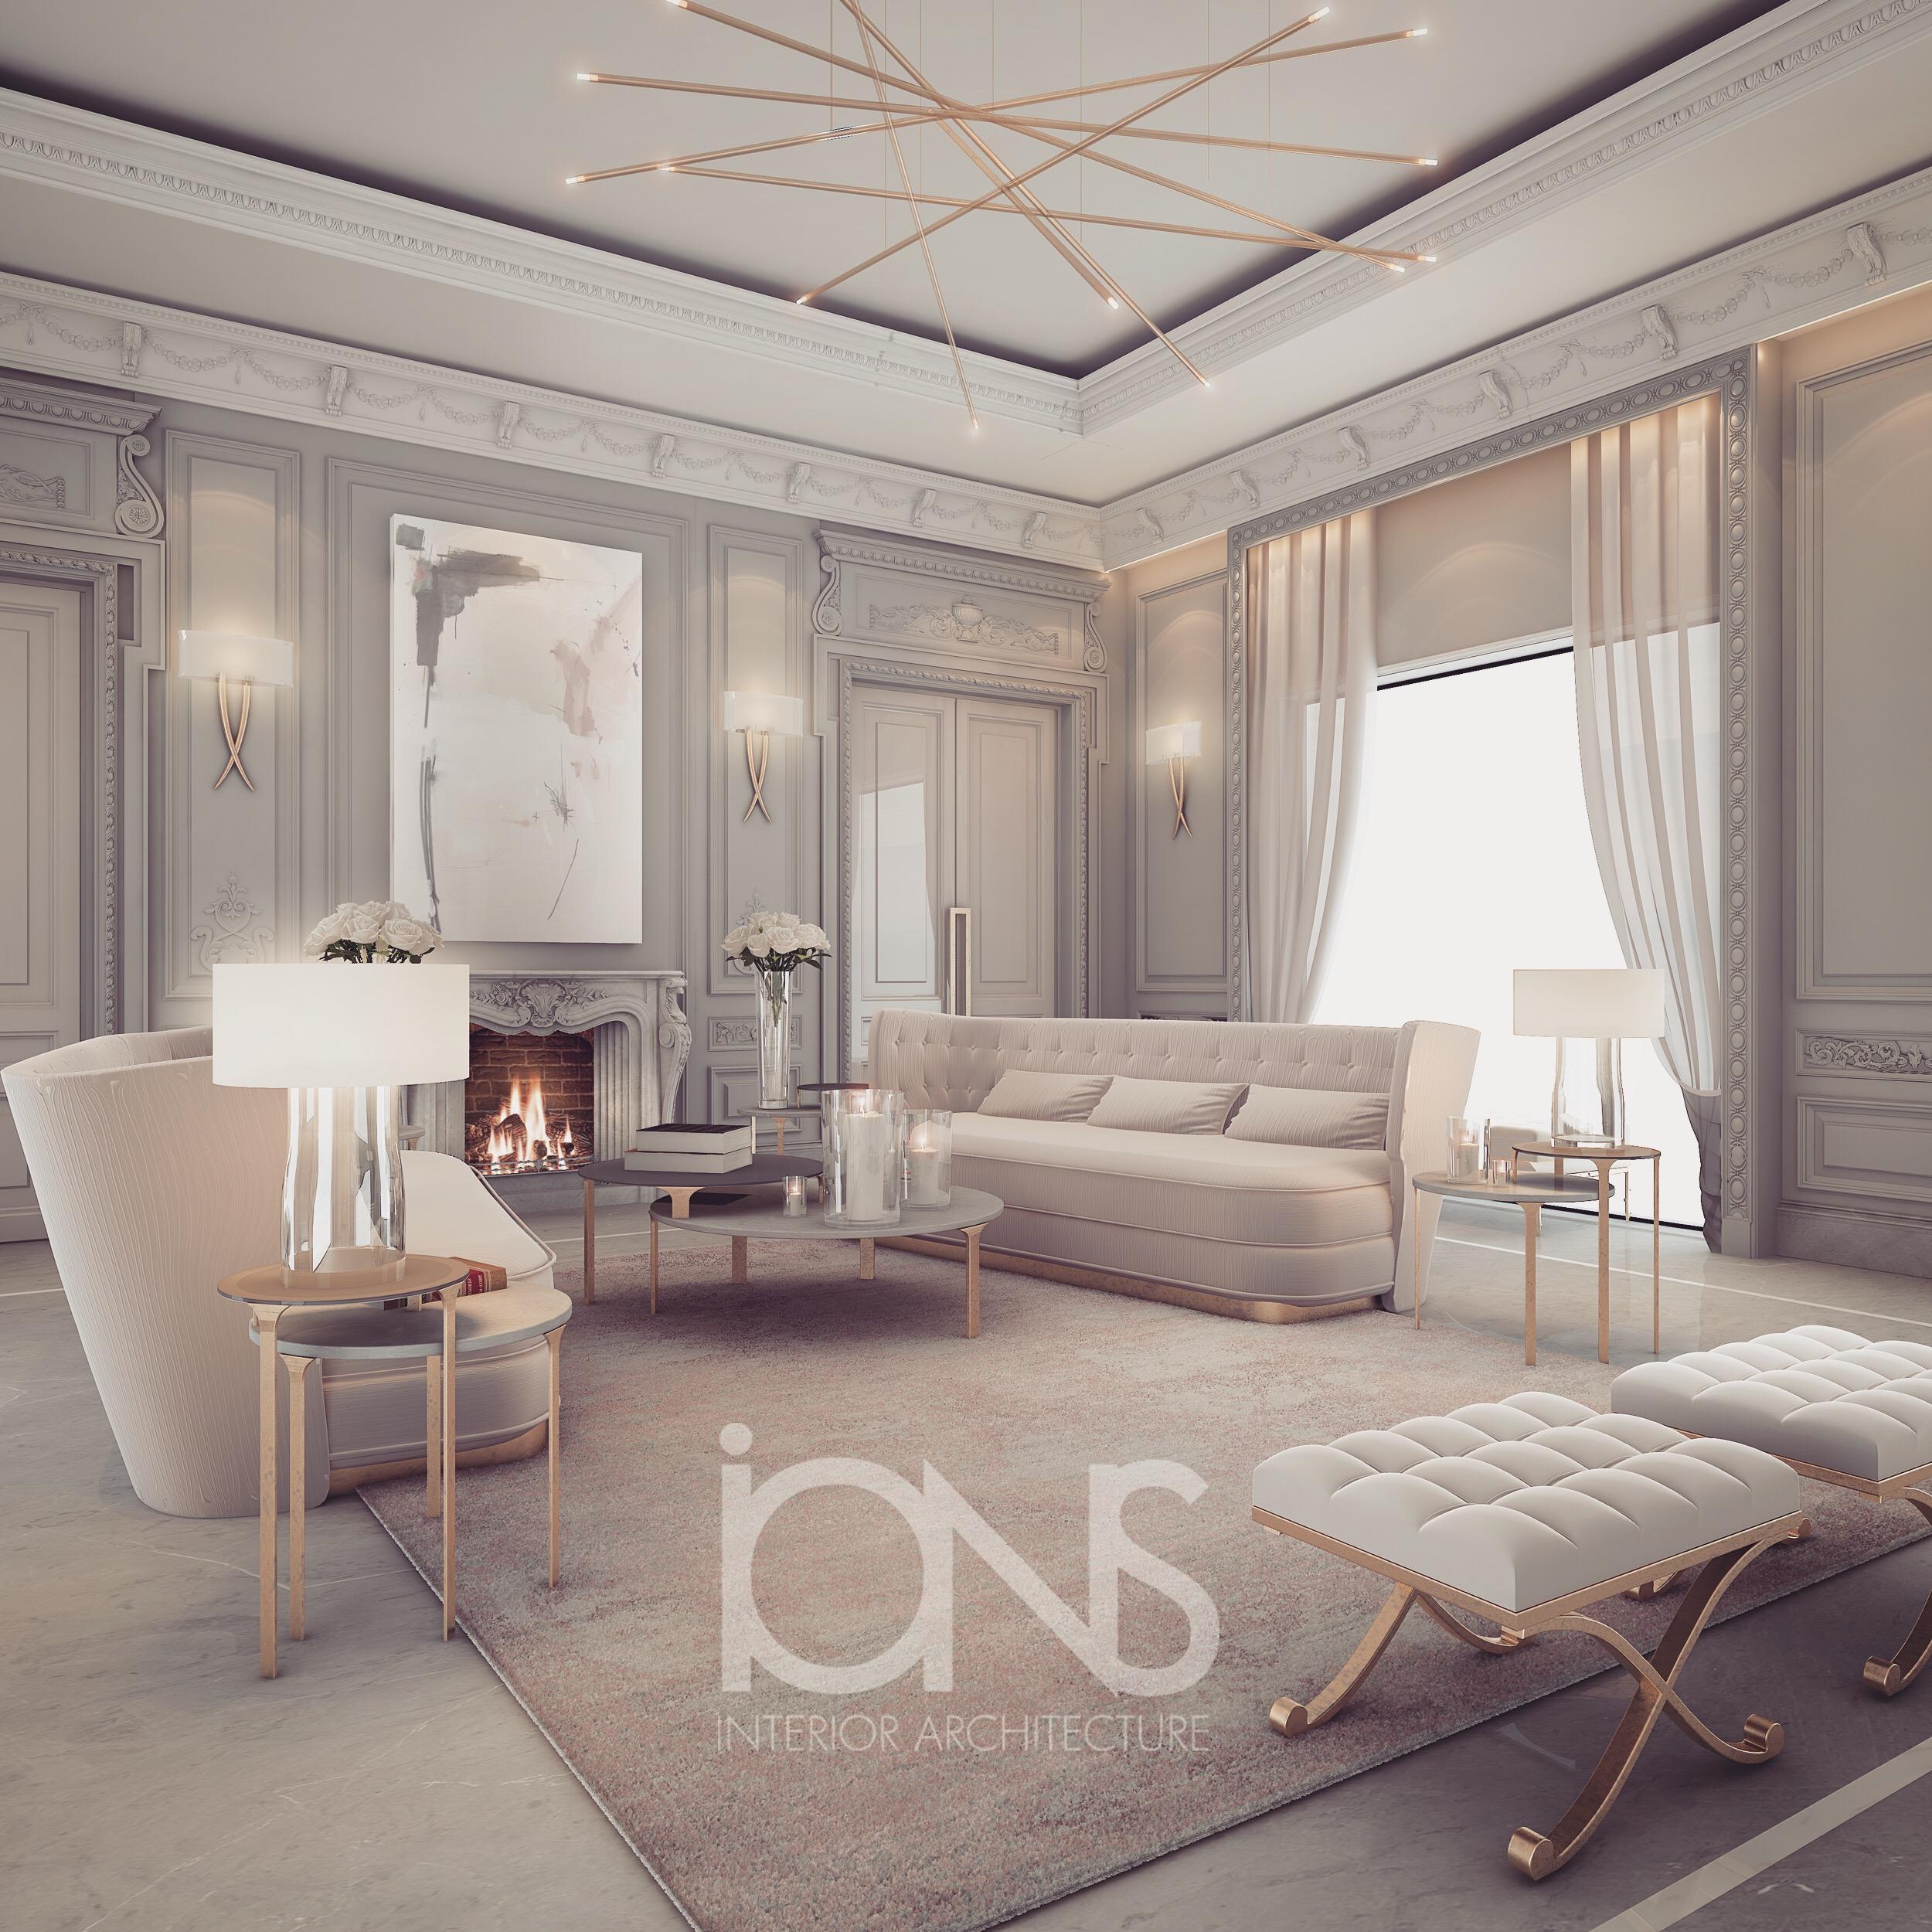 Stylish Residential Interior Design